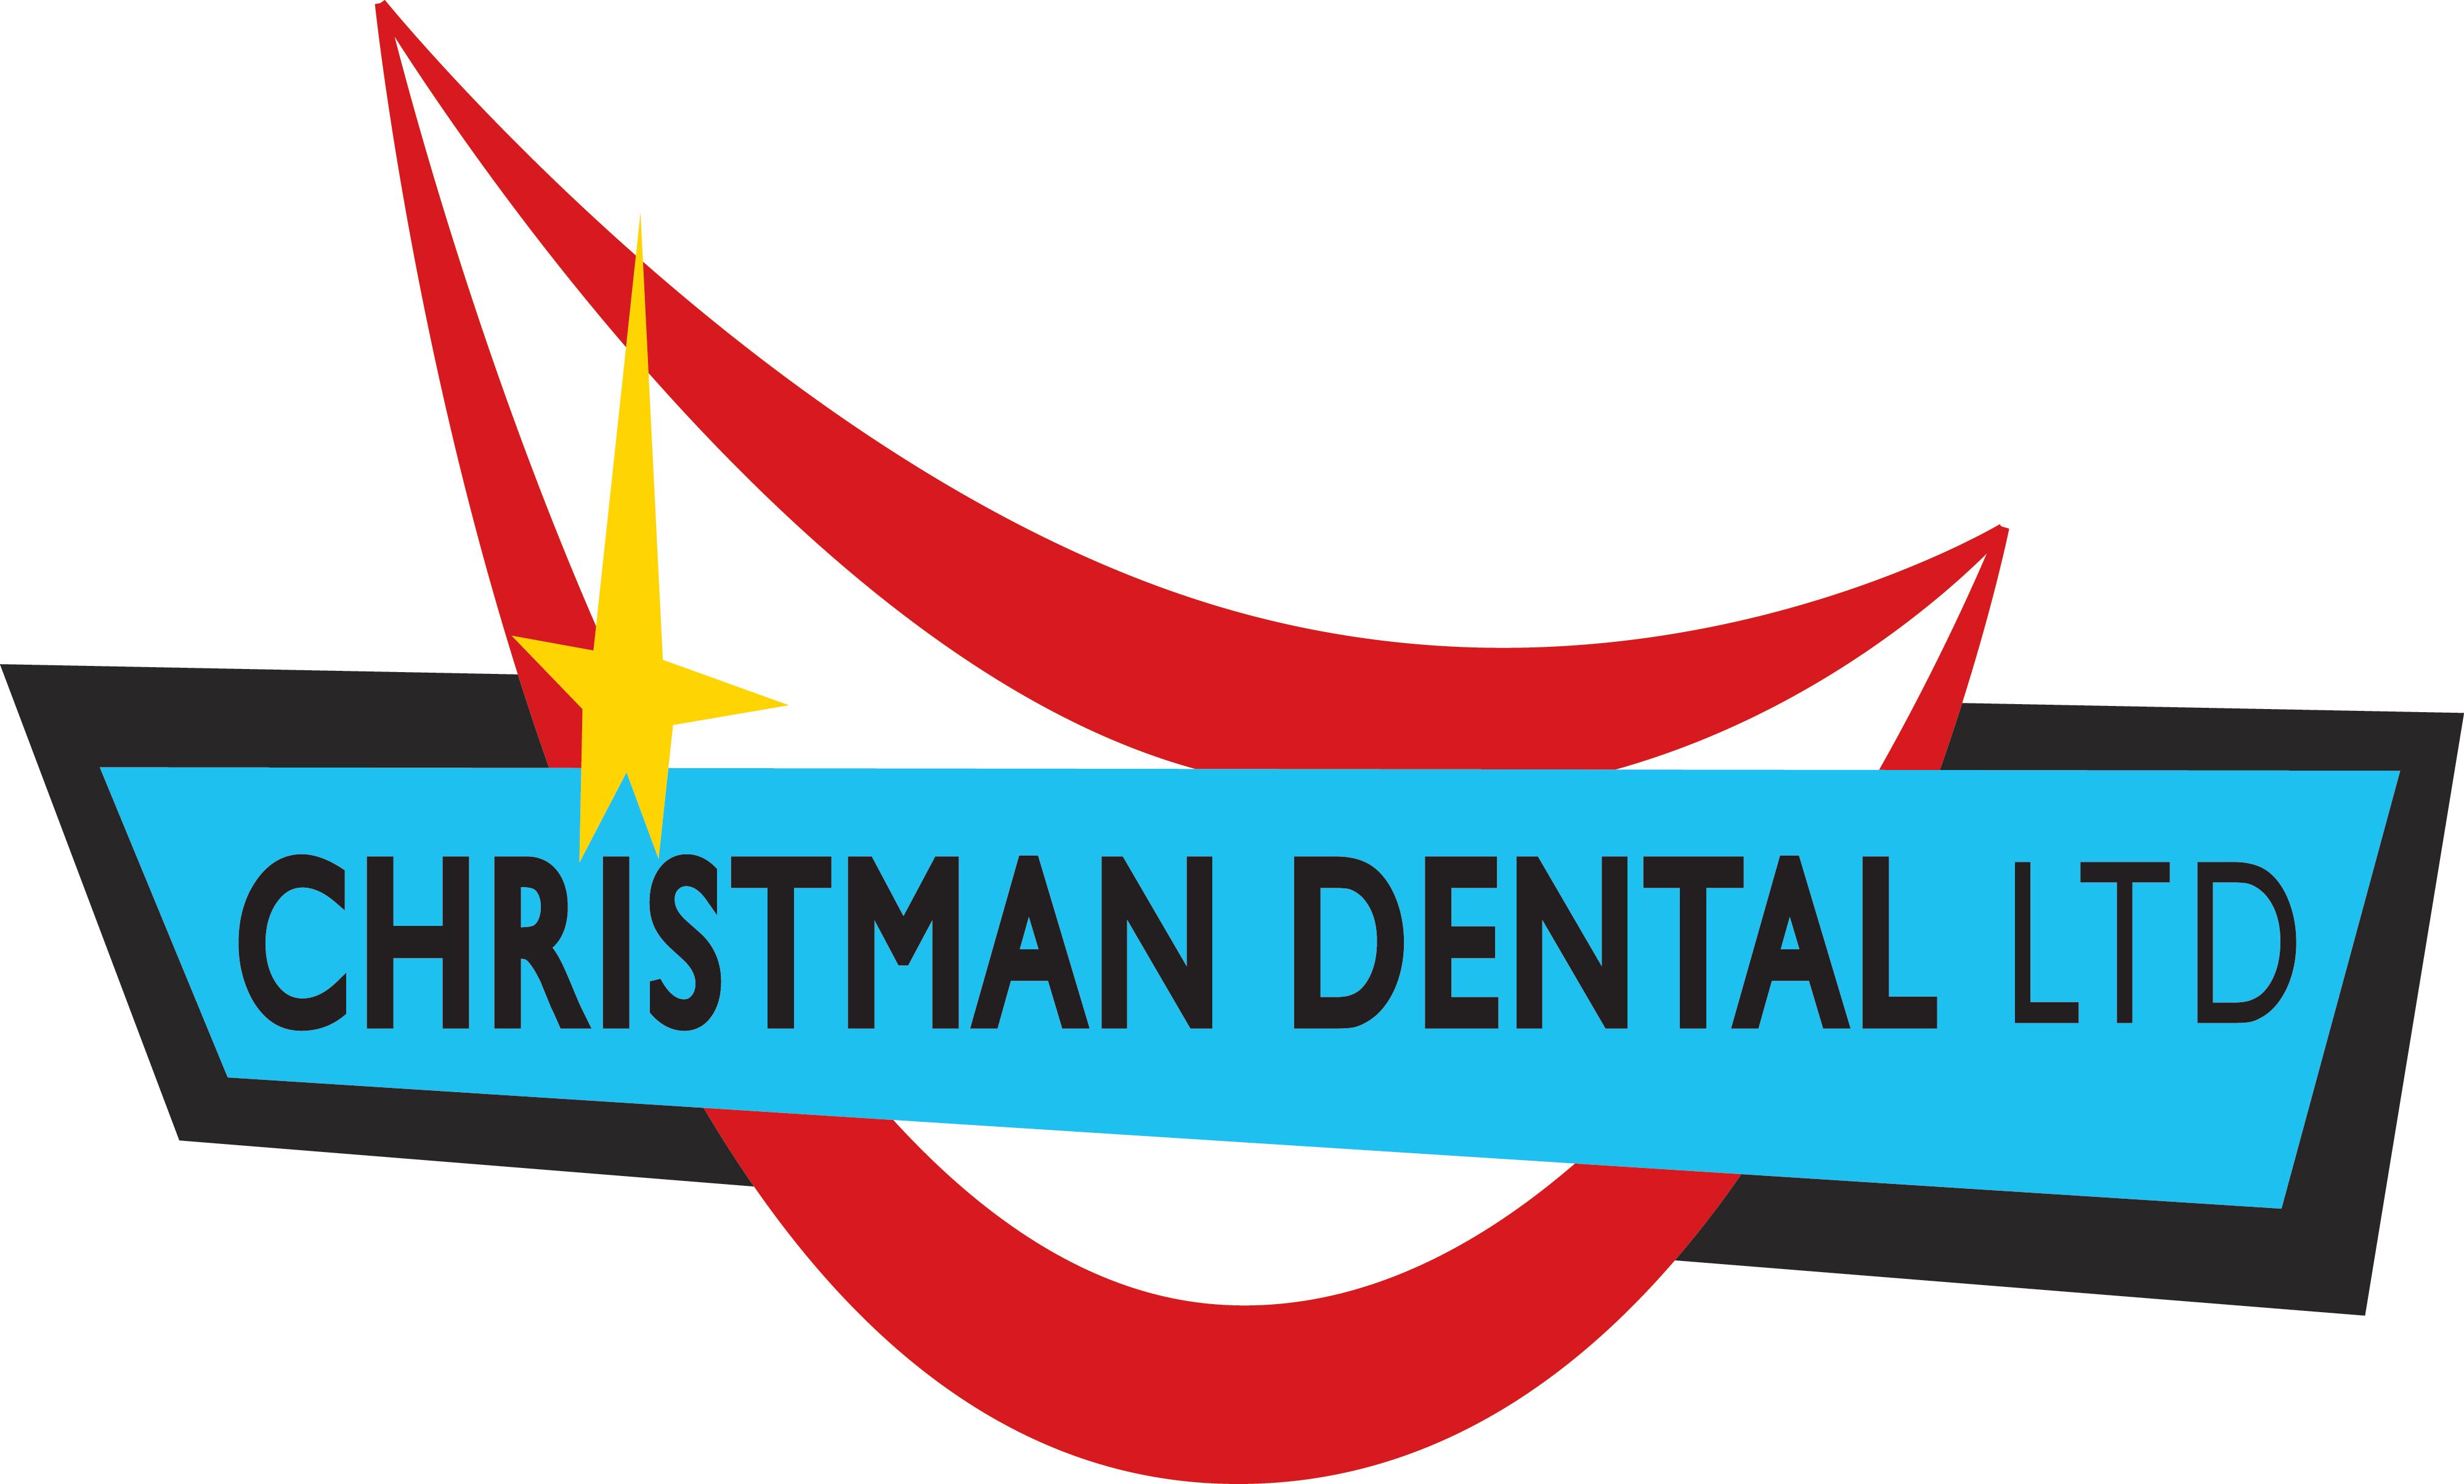 Christman Dental